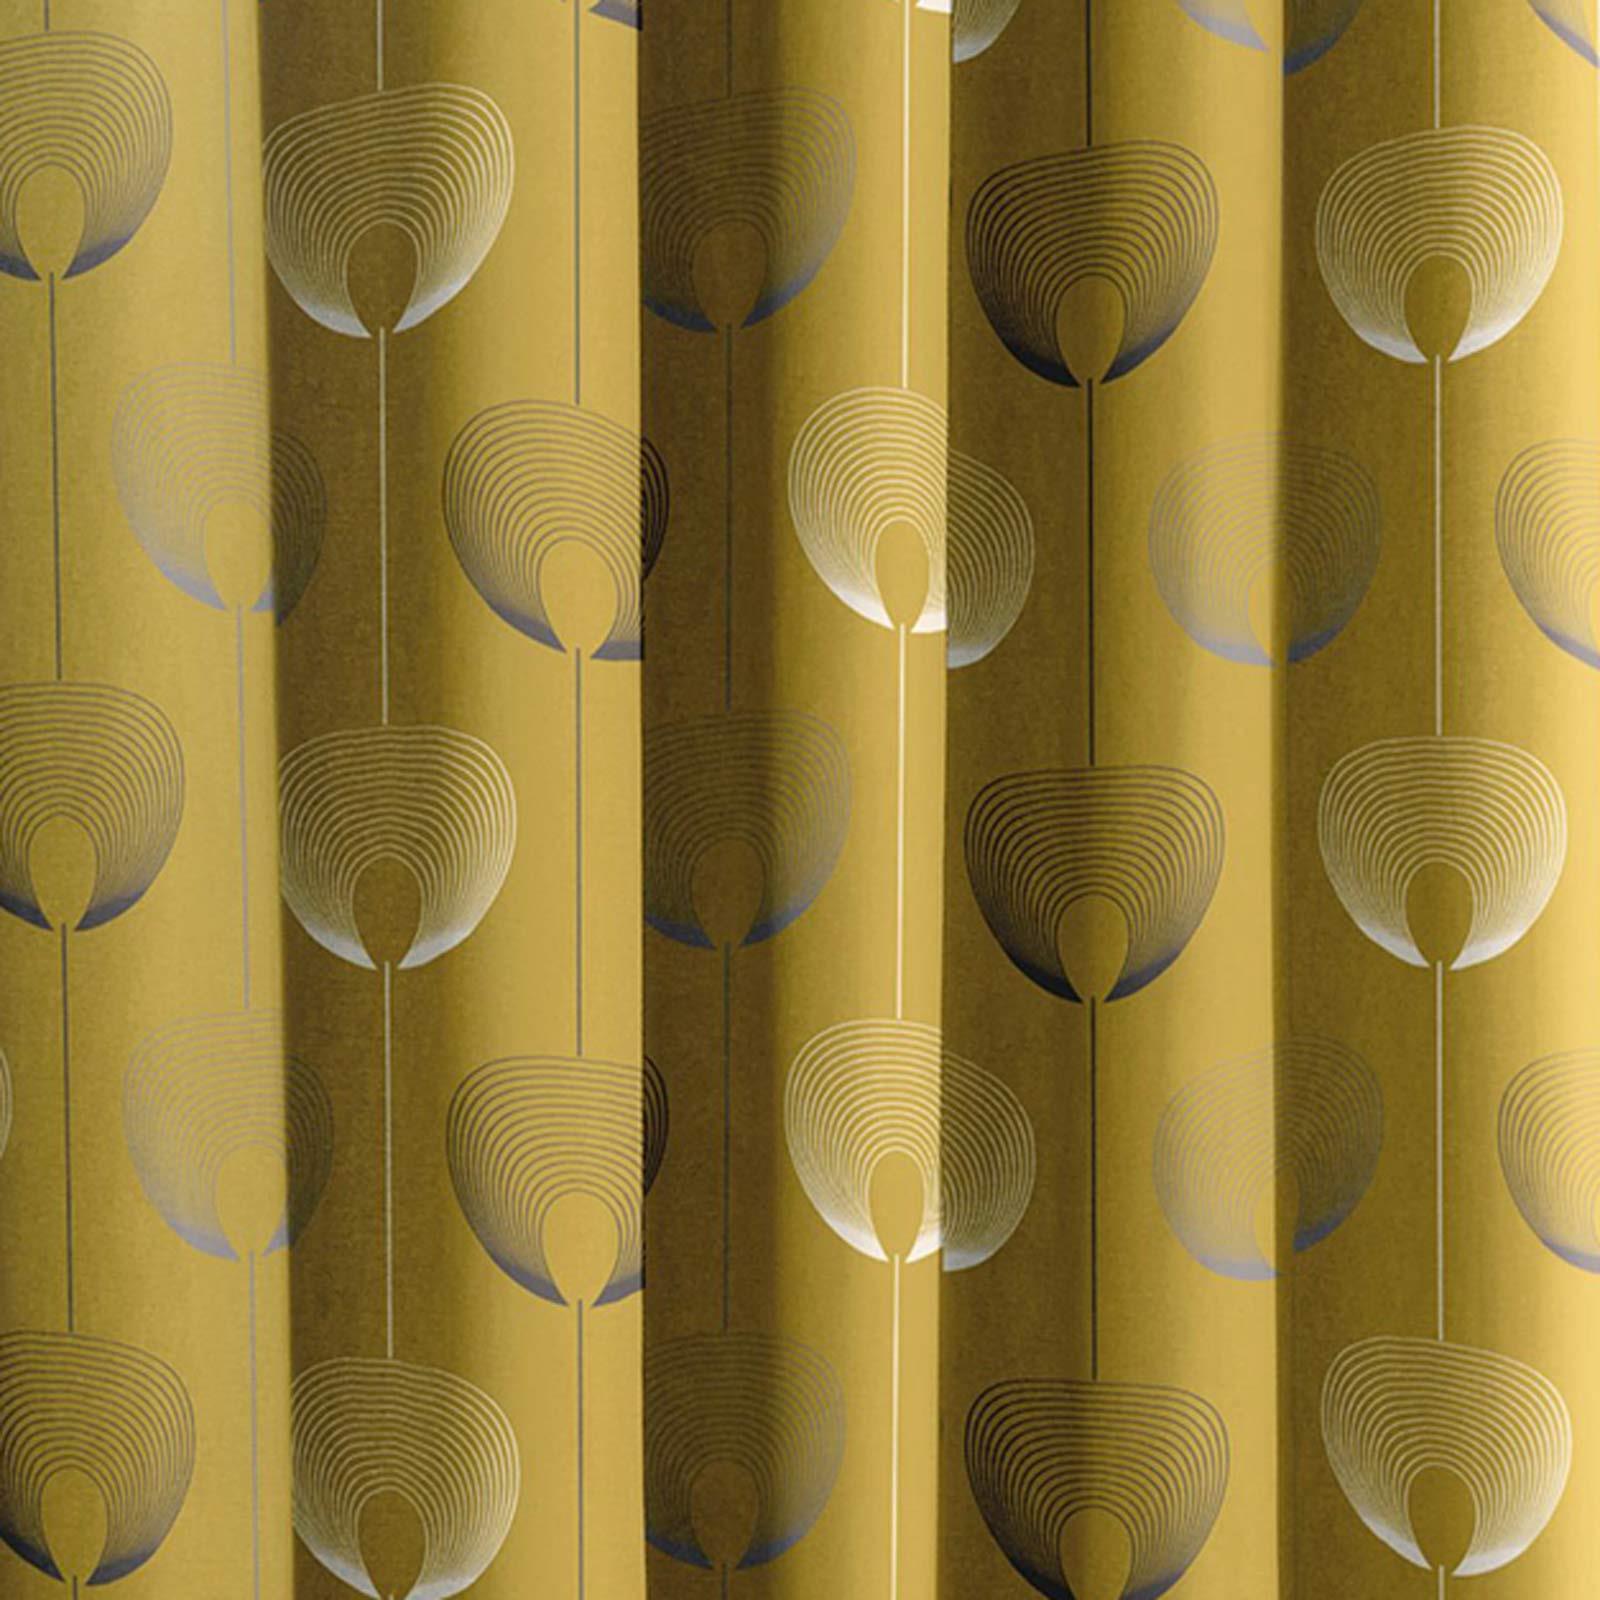 Cortina-con-Ojales-de-mostaza-pares-Amarillo-Ocre-Anillo-Top-Forrado-Listo-Cortinas miniatura 28